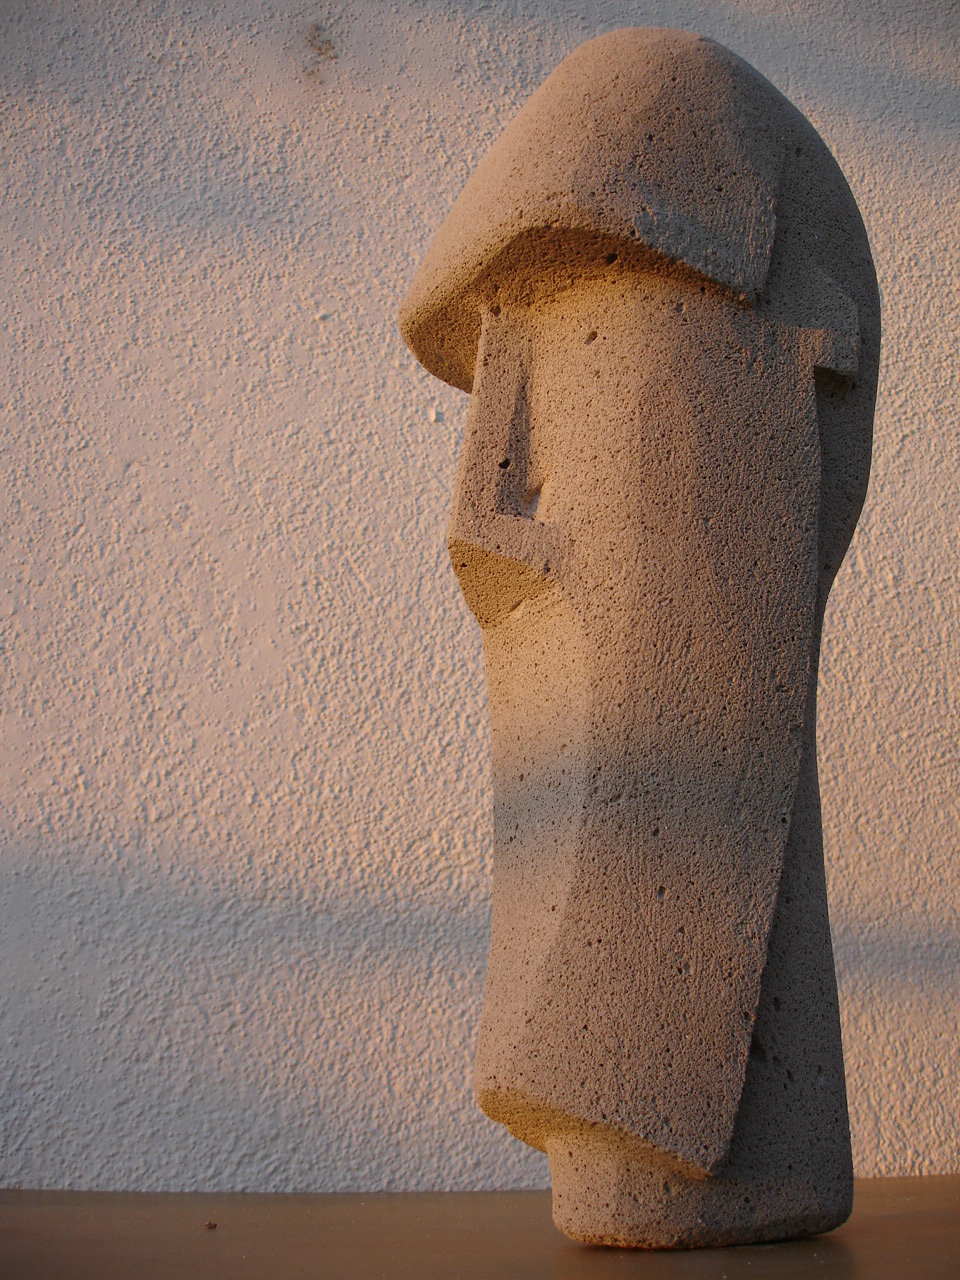 Long head - 30cm Perlite block